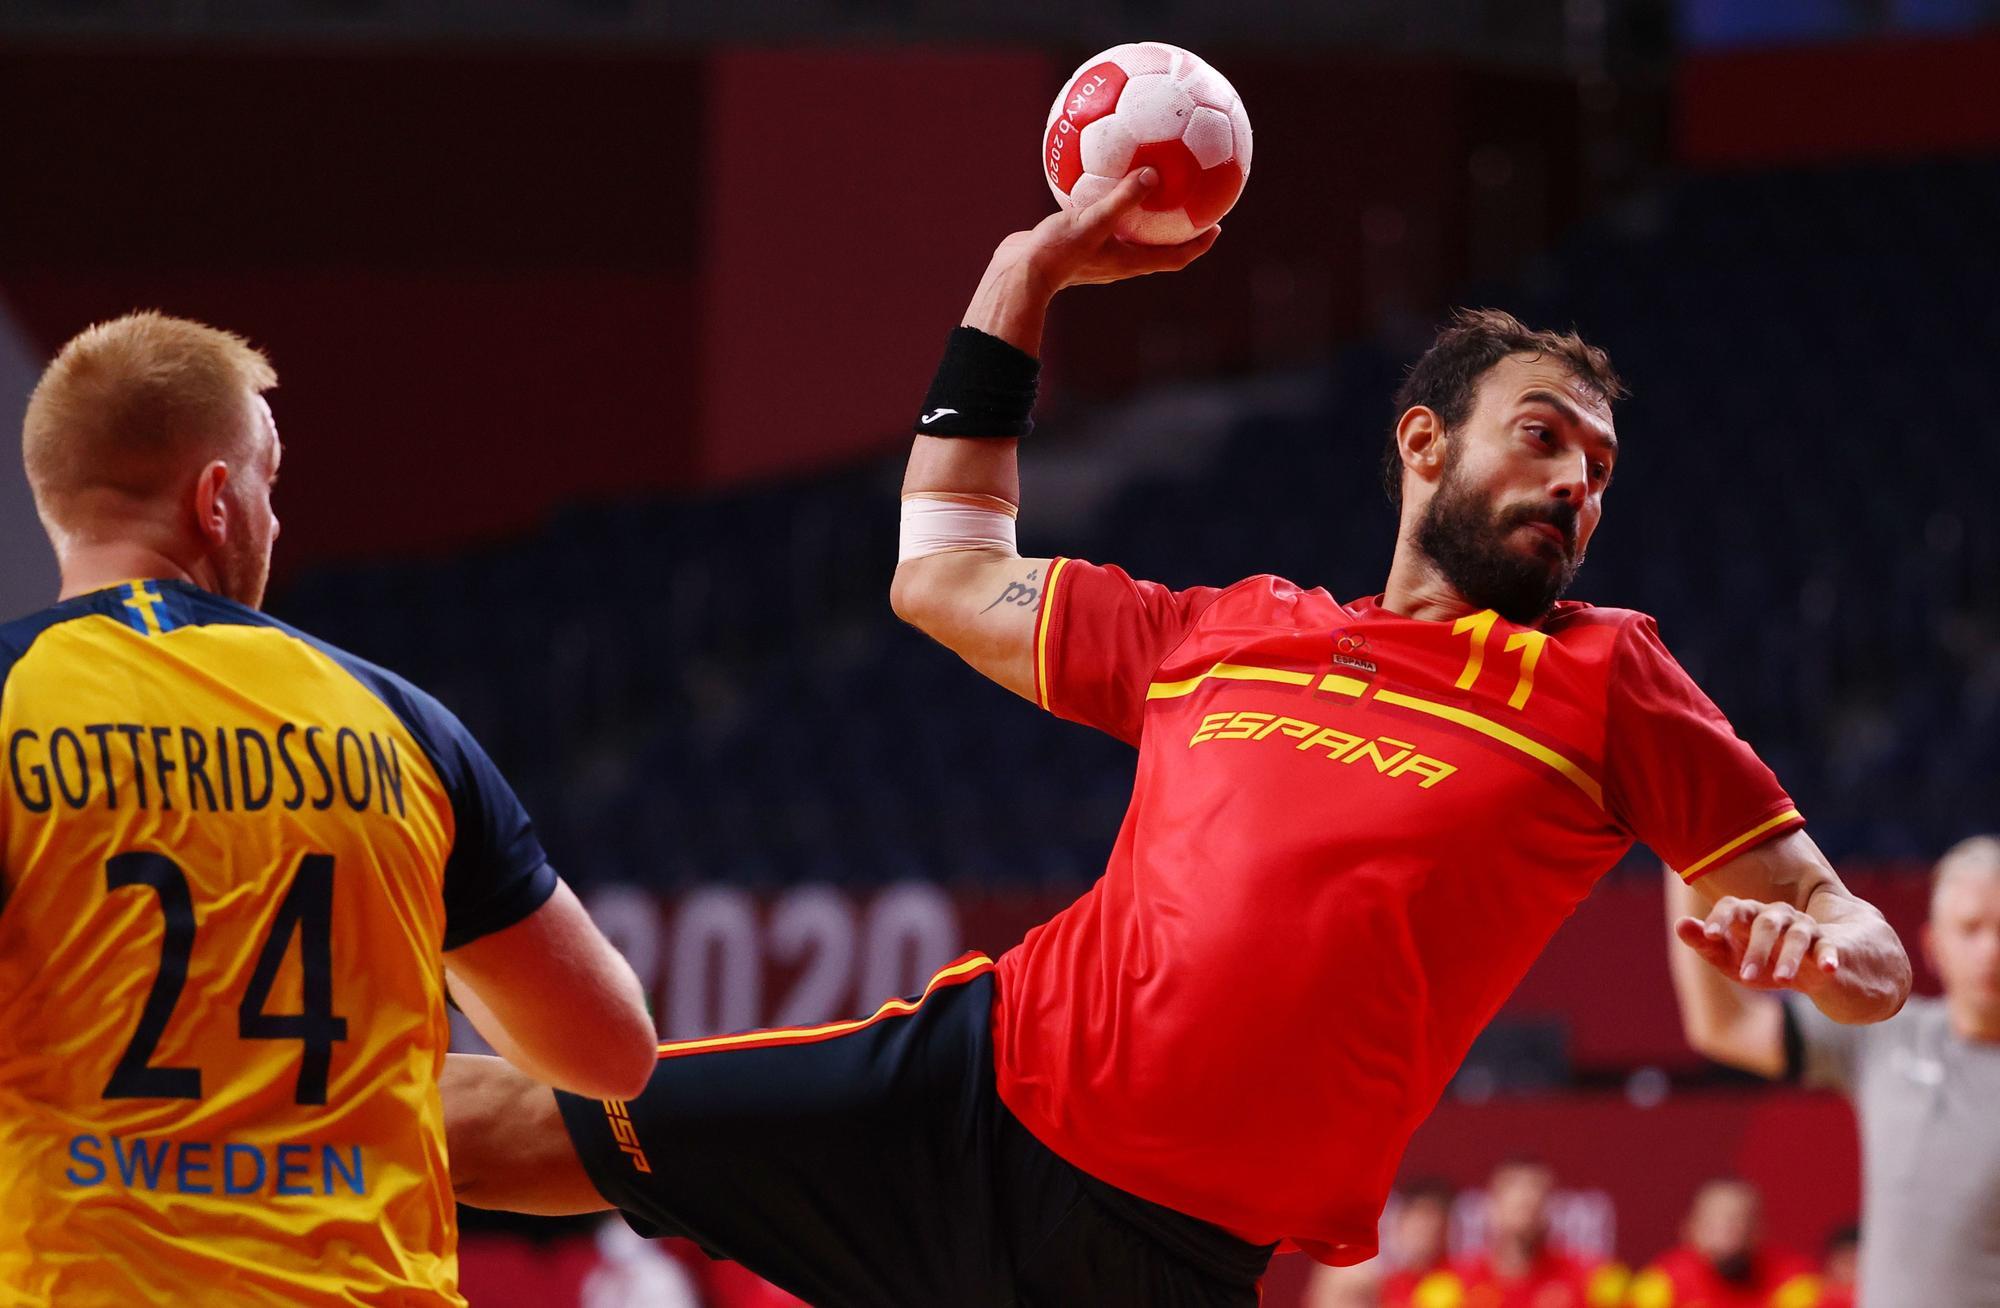 Tokio 2020, balonmano masculino: Suecia - España